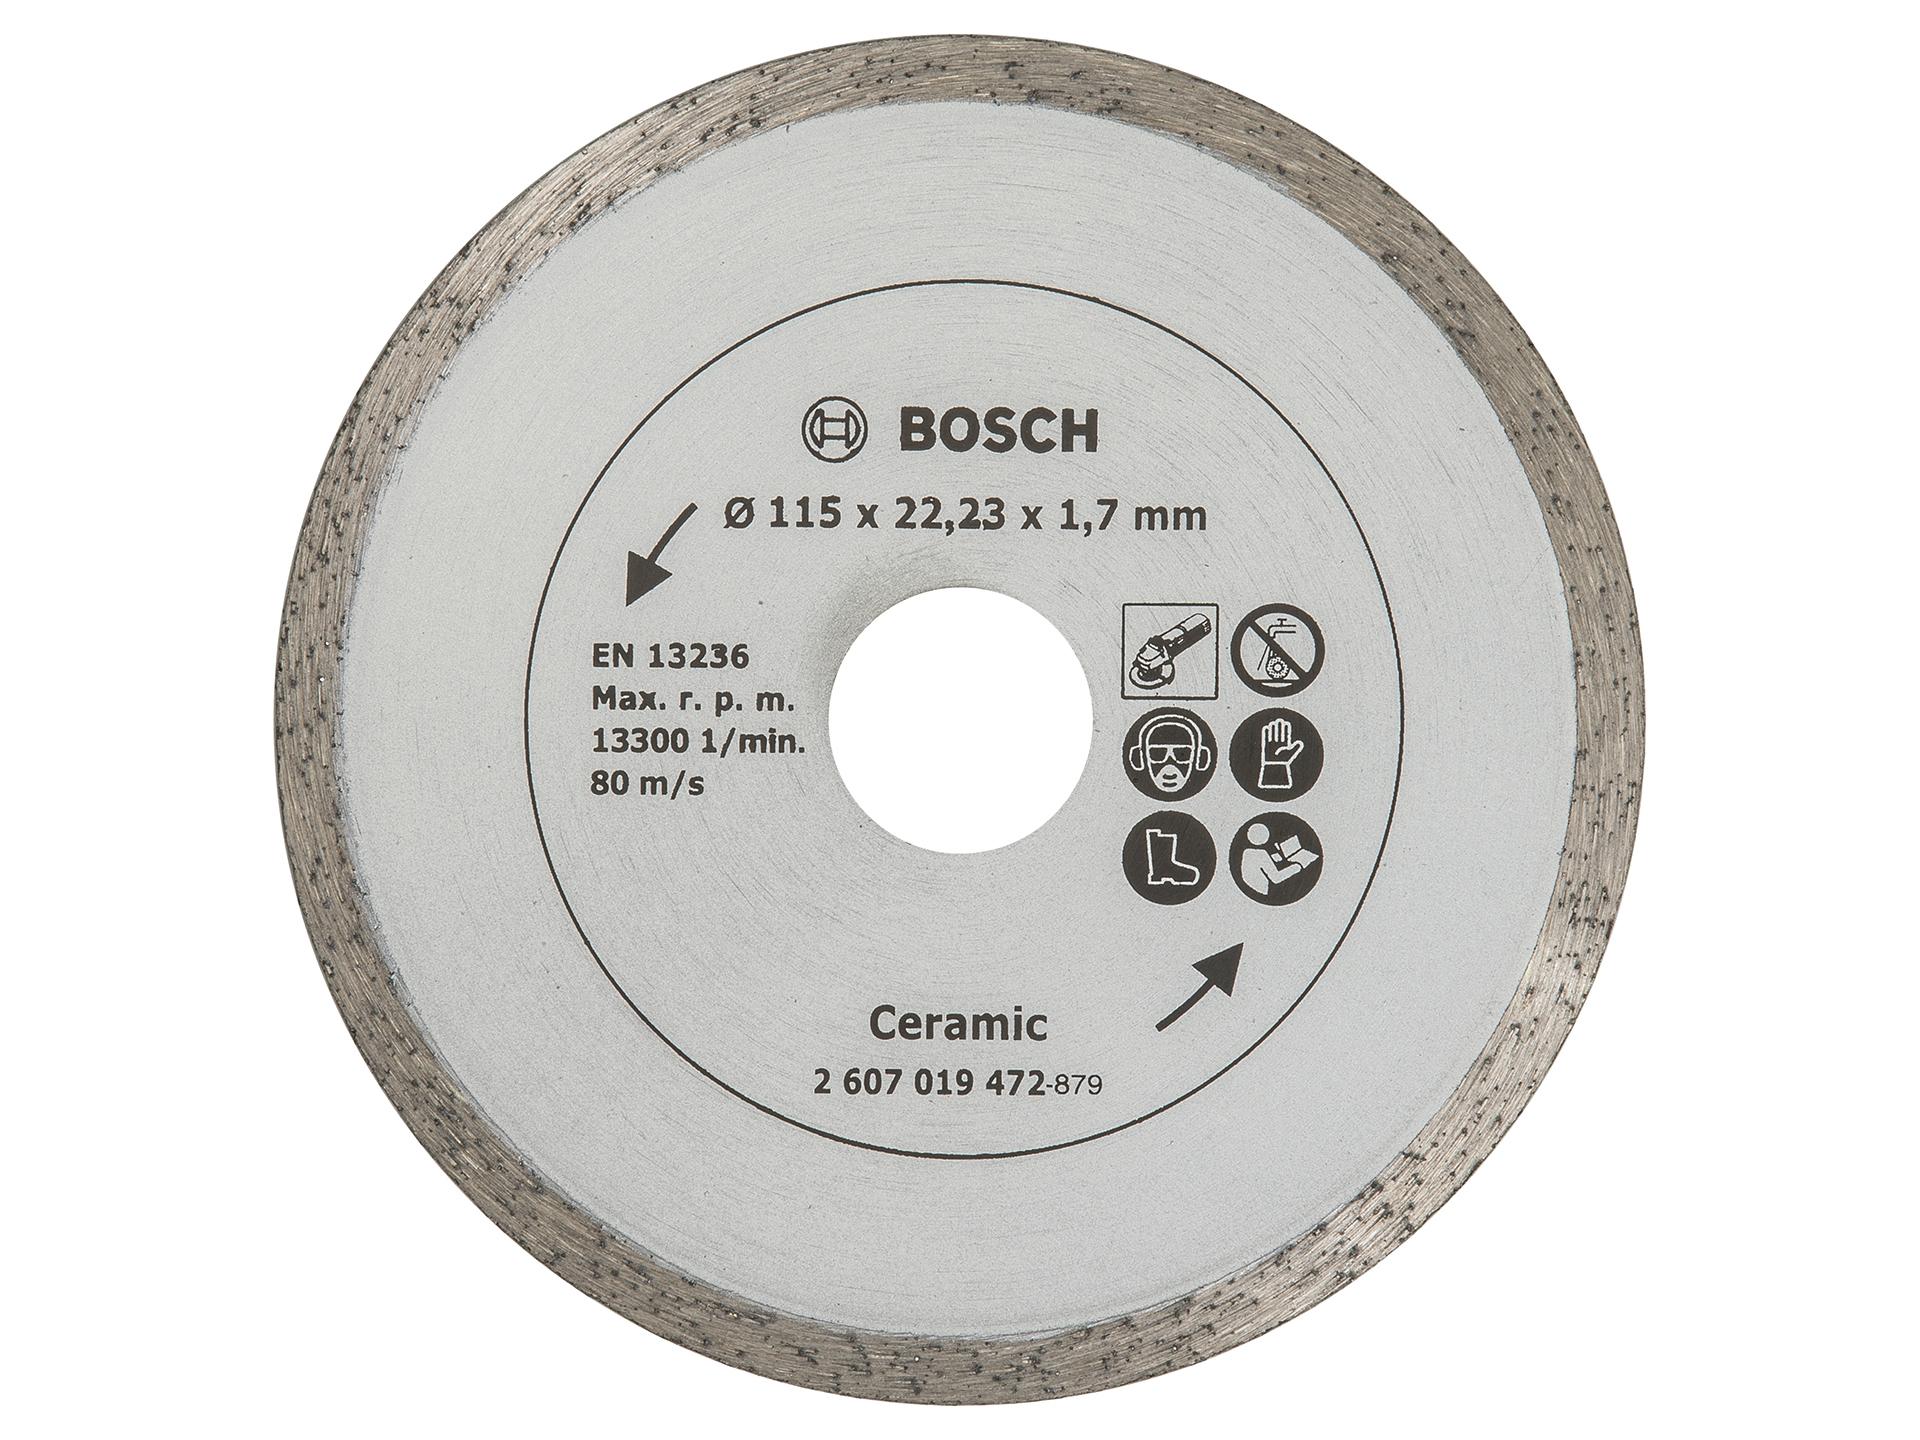 Tegels Den Bosch : Bosch diamantschijf tegels 115mm hubo